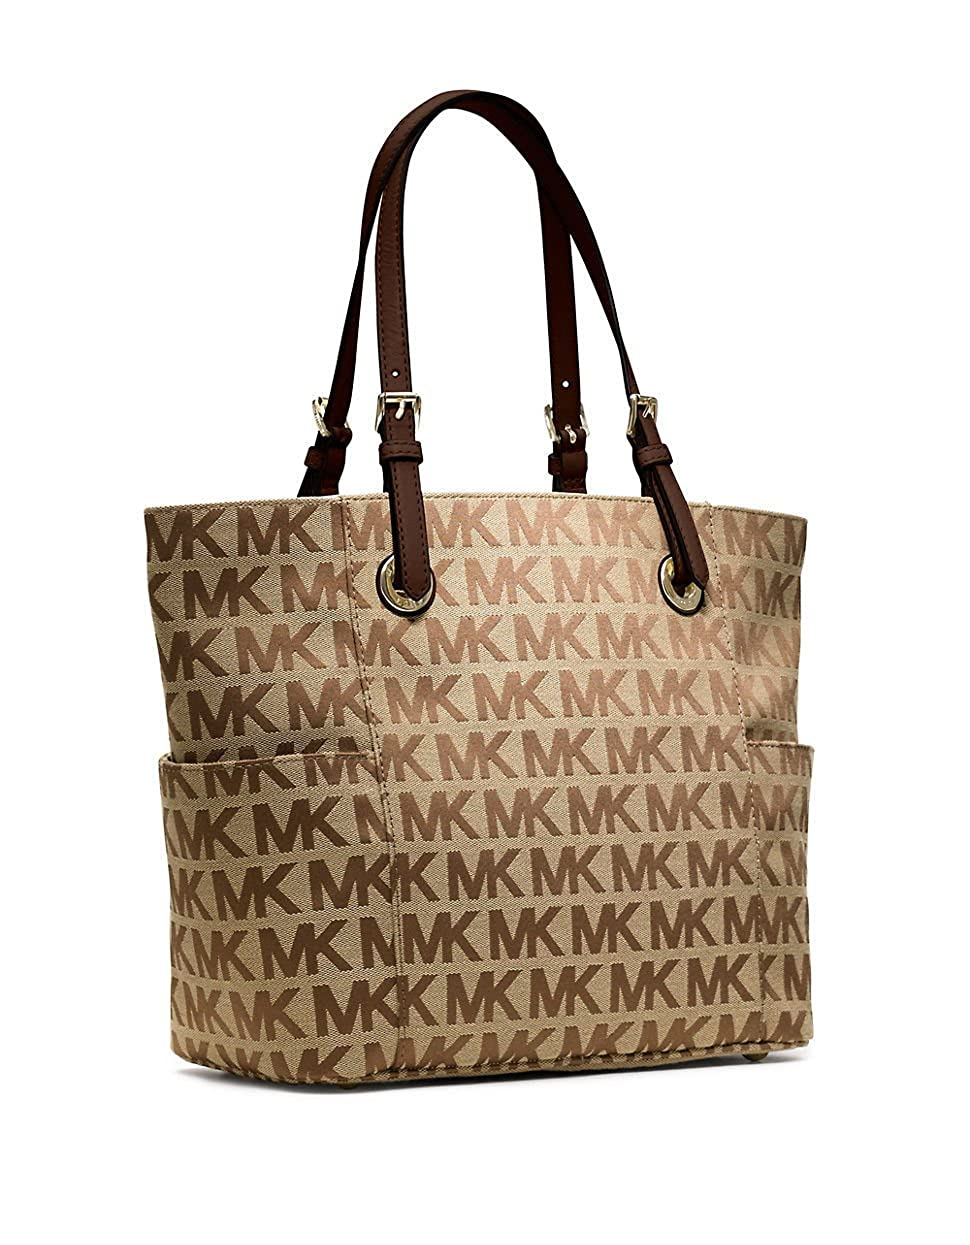 8db7a85c04 Michael Kors Jet Set East West Tote in Signature Beige Ebony   Mocha  Jacquard  Handbags  Amazon.com